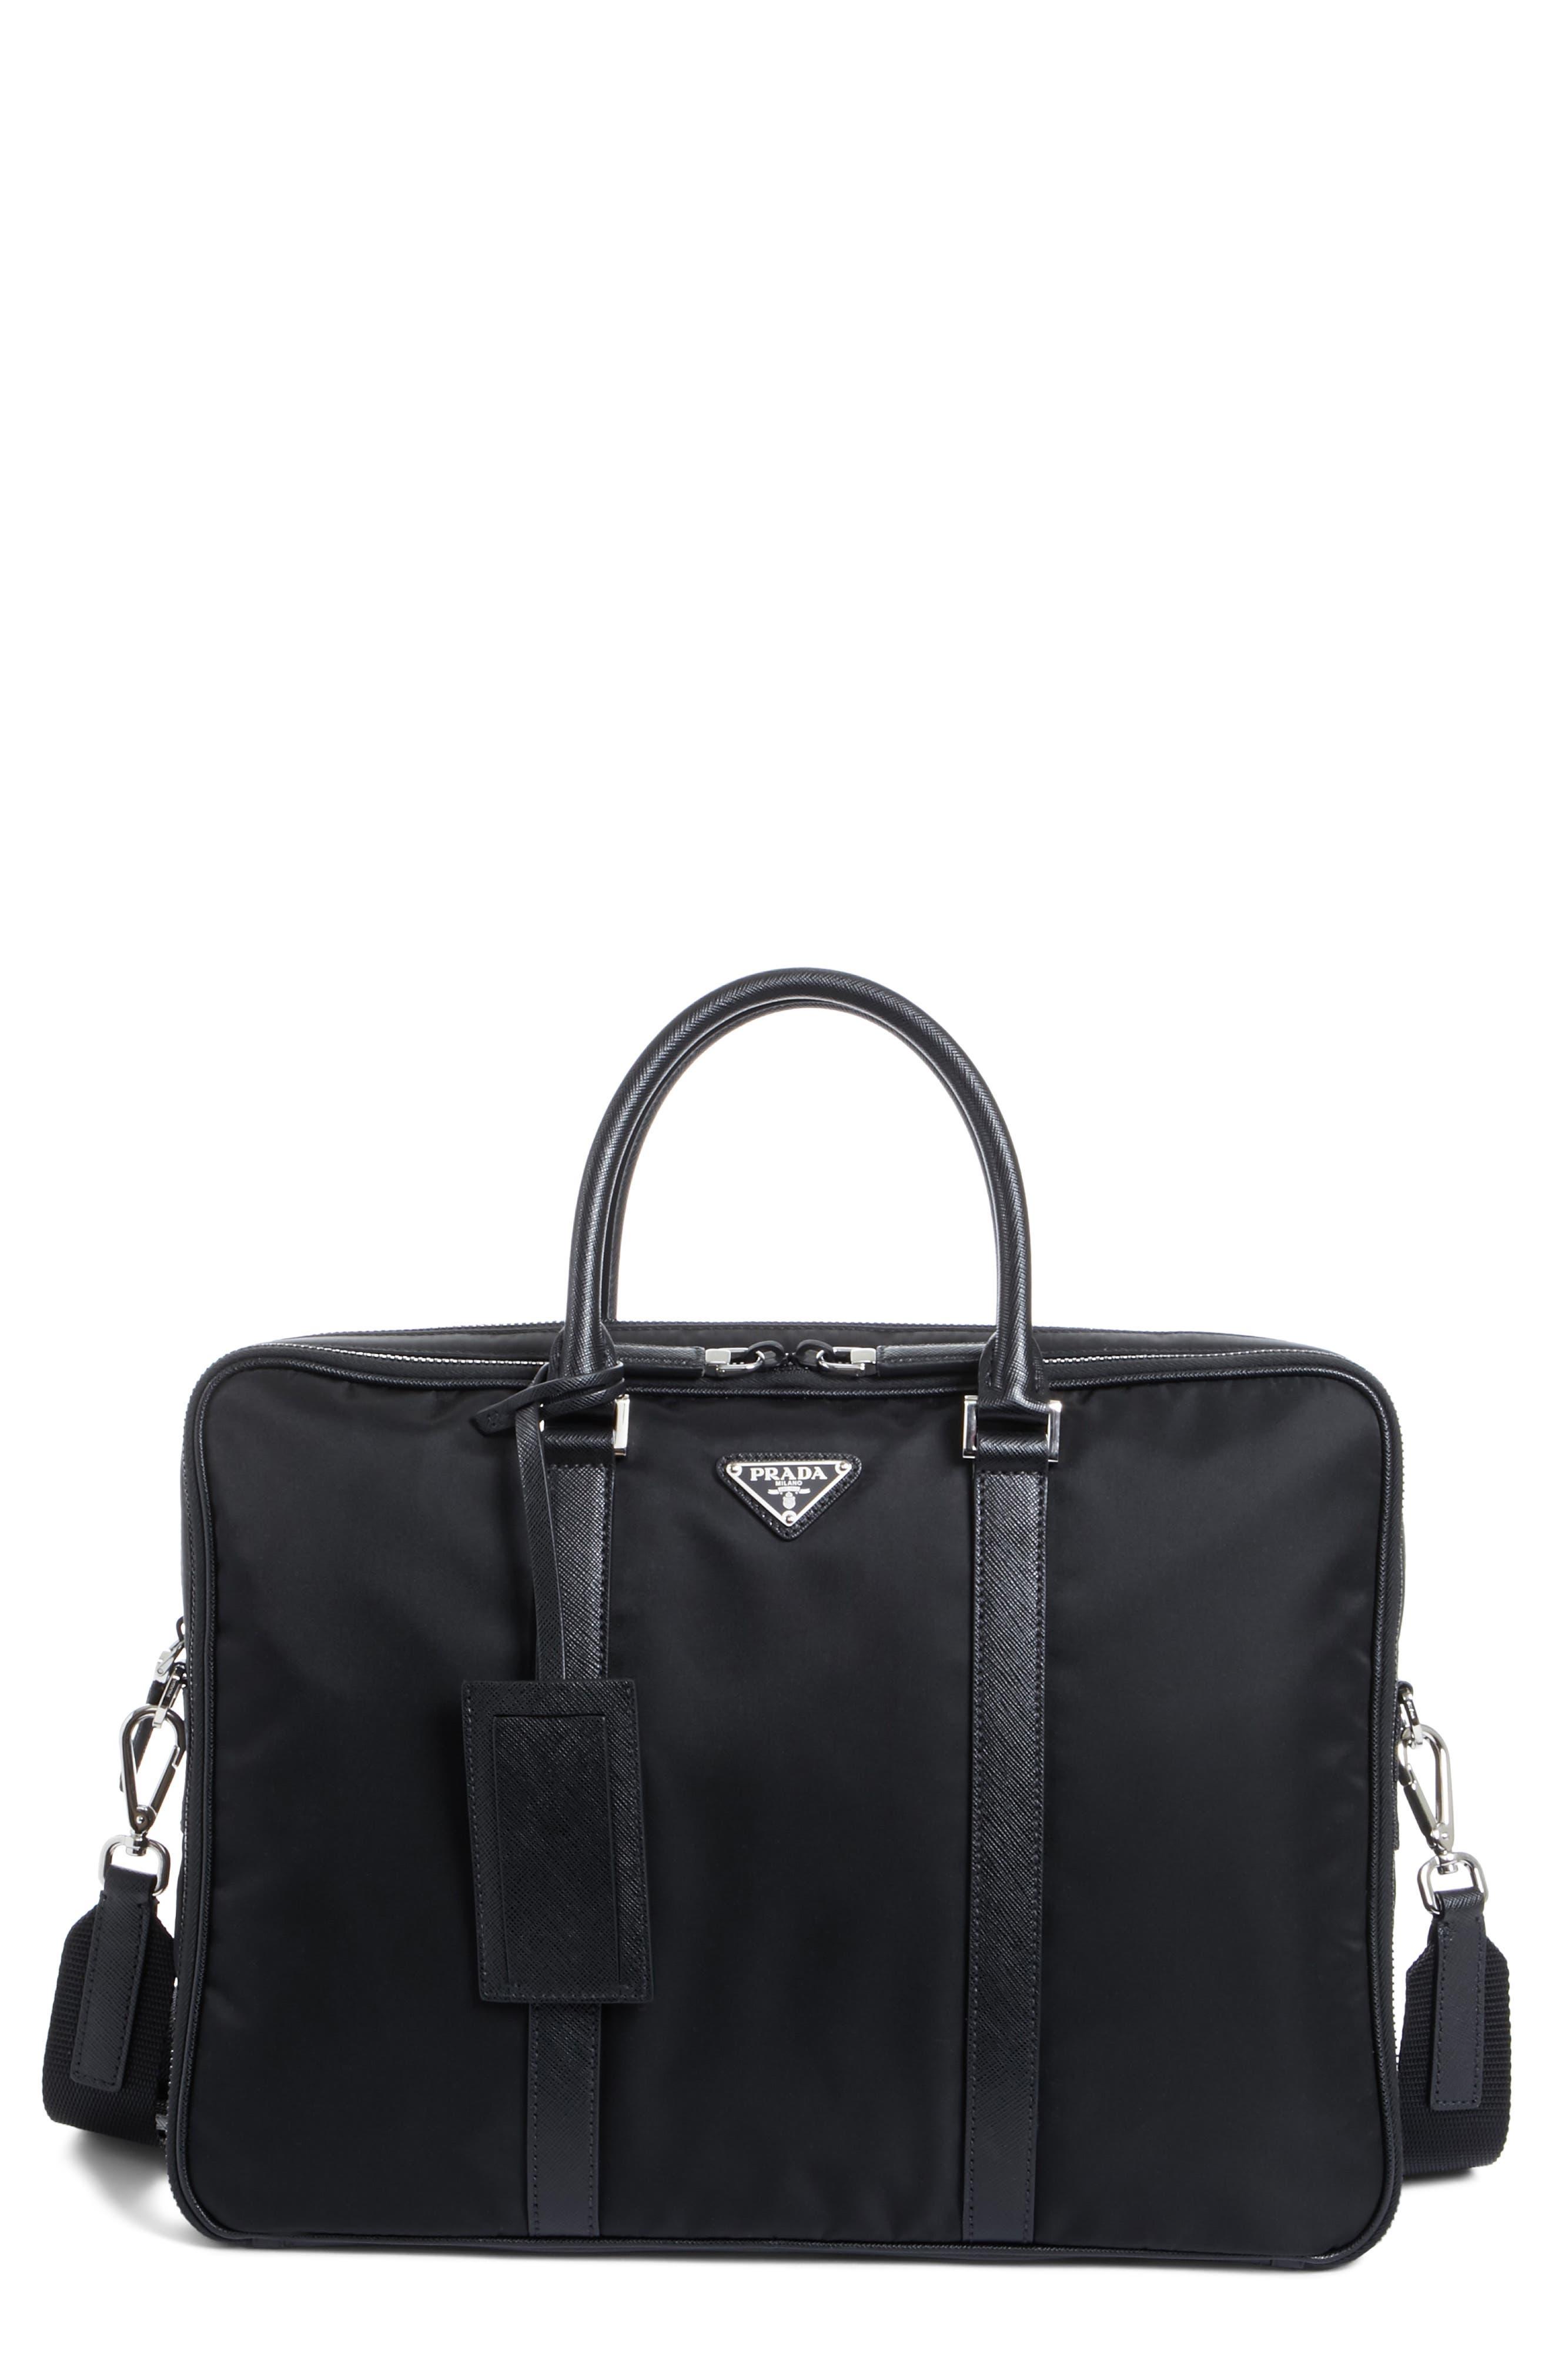 a2e27f662328 Men s Prada Bags   Backpacks